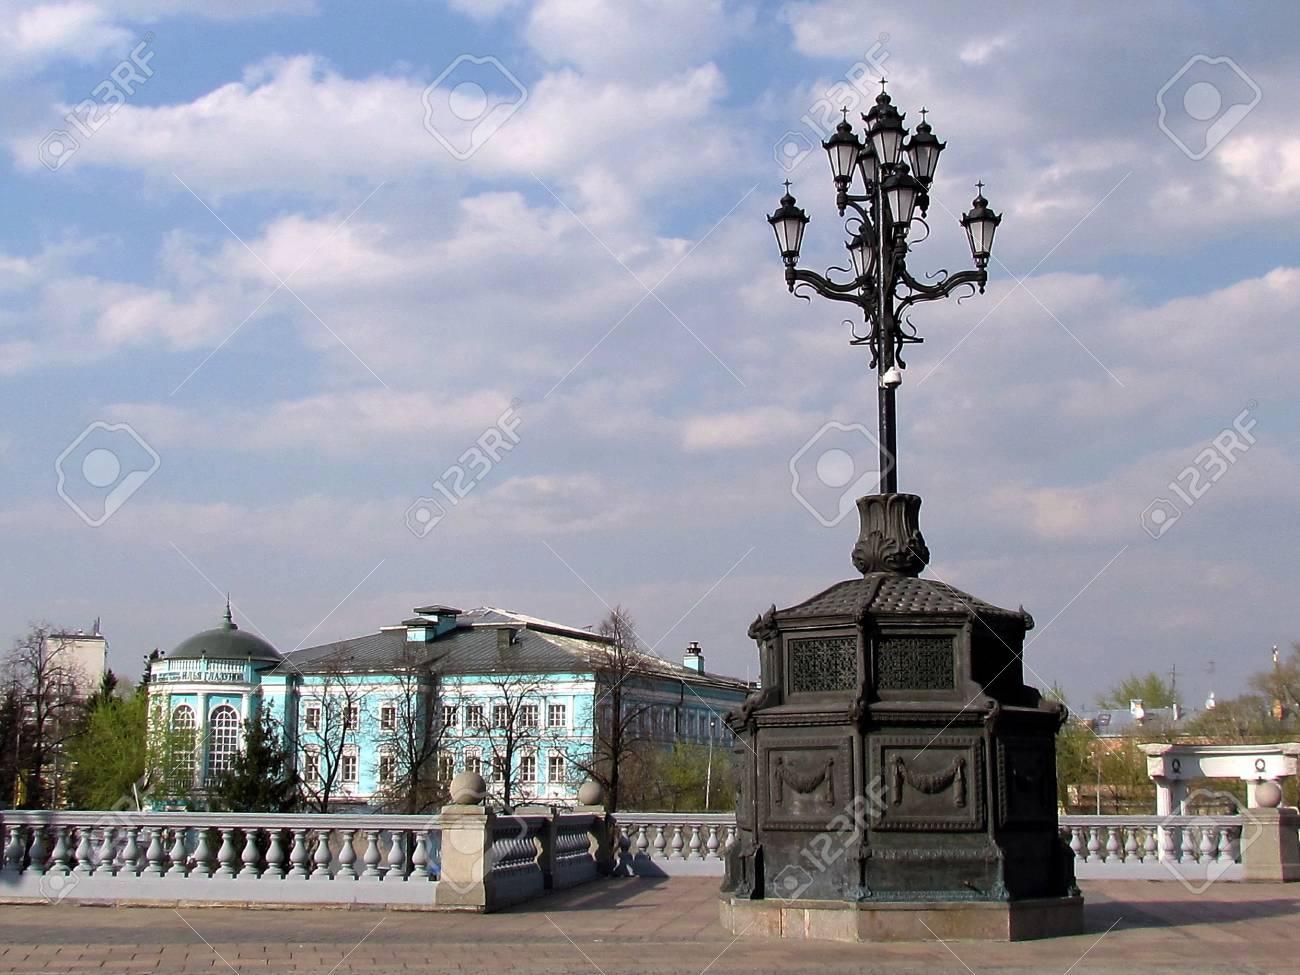 Street Lamp In Retro Style near Glazunov Gallery in Moscow, Russia                               Stock Photo - 13437081